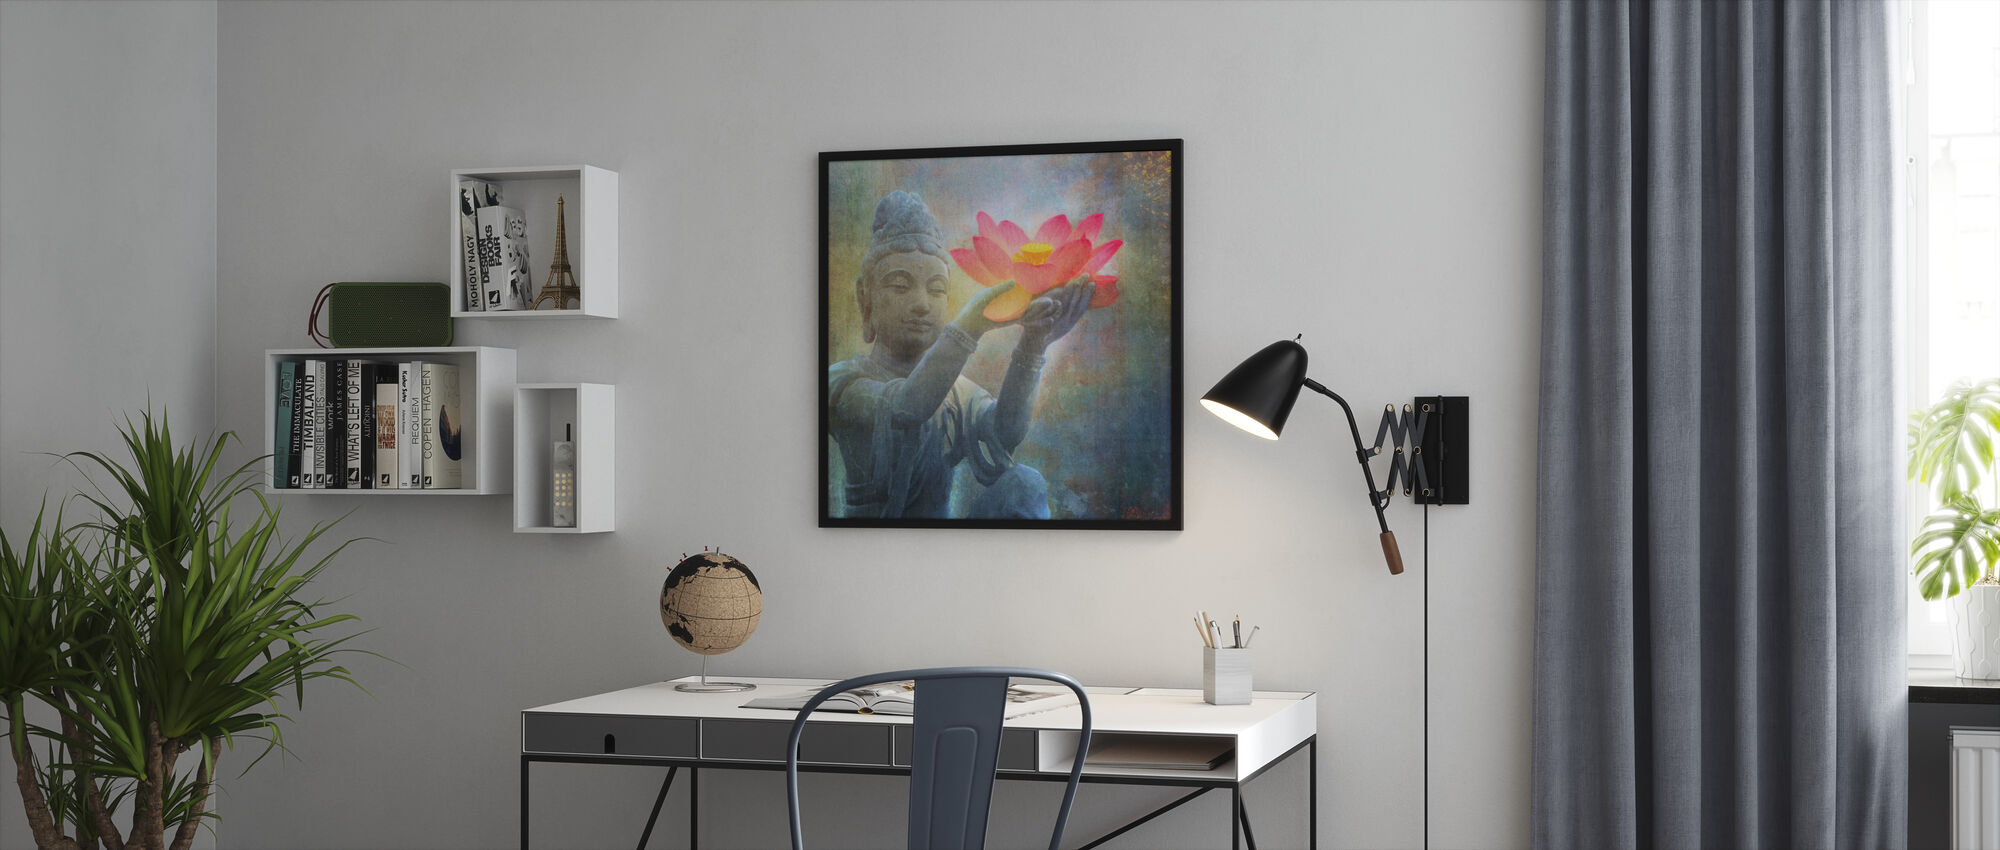 Lotus Budda kvadrat - Innrammet bilde - Kontor